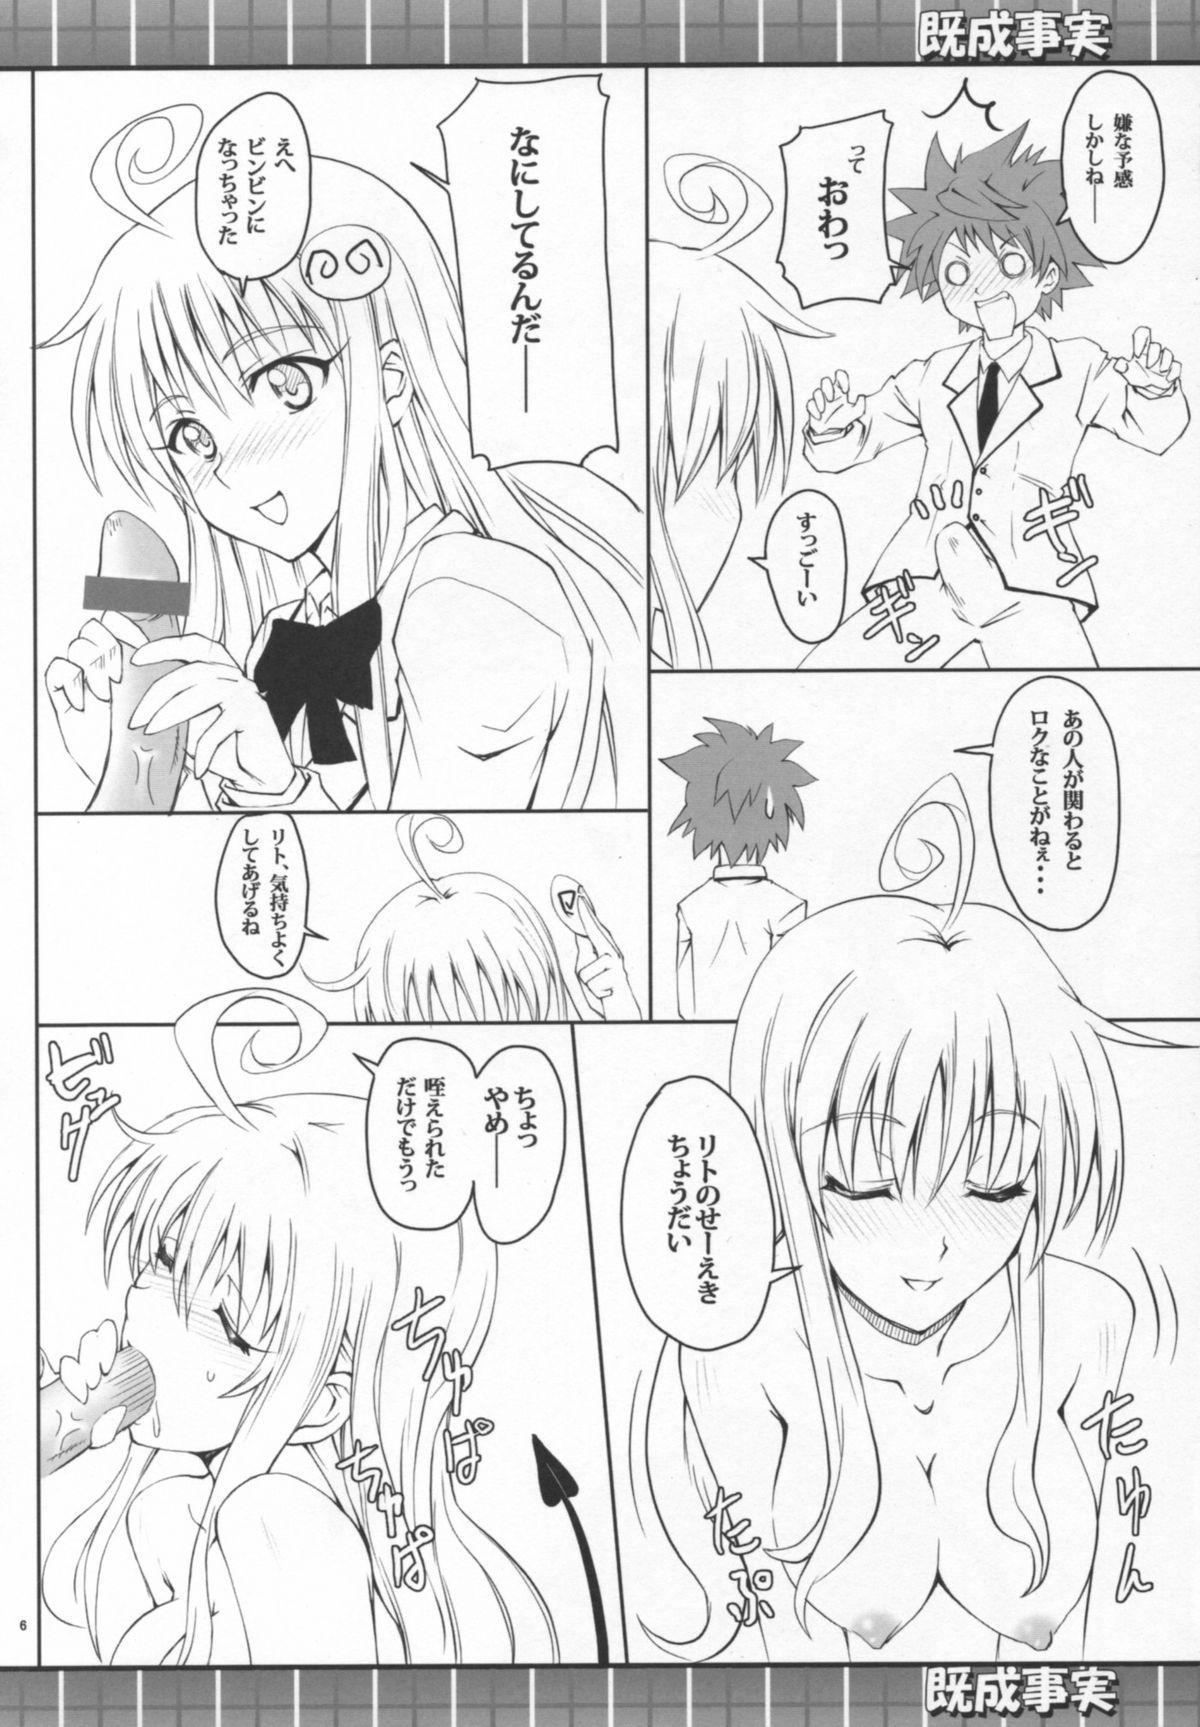 Kiseijijitsu 4